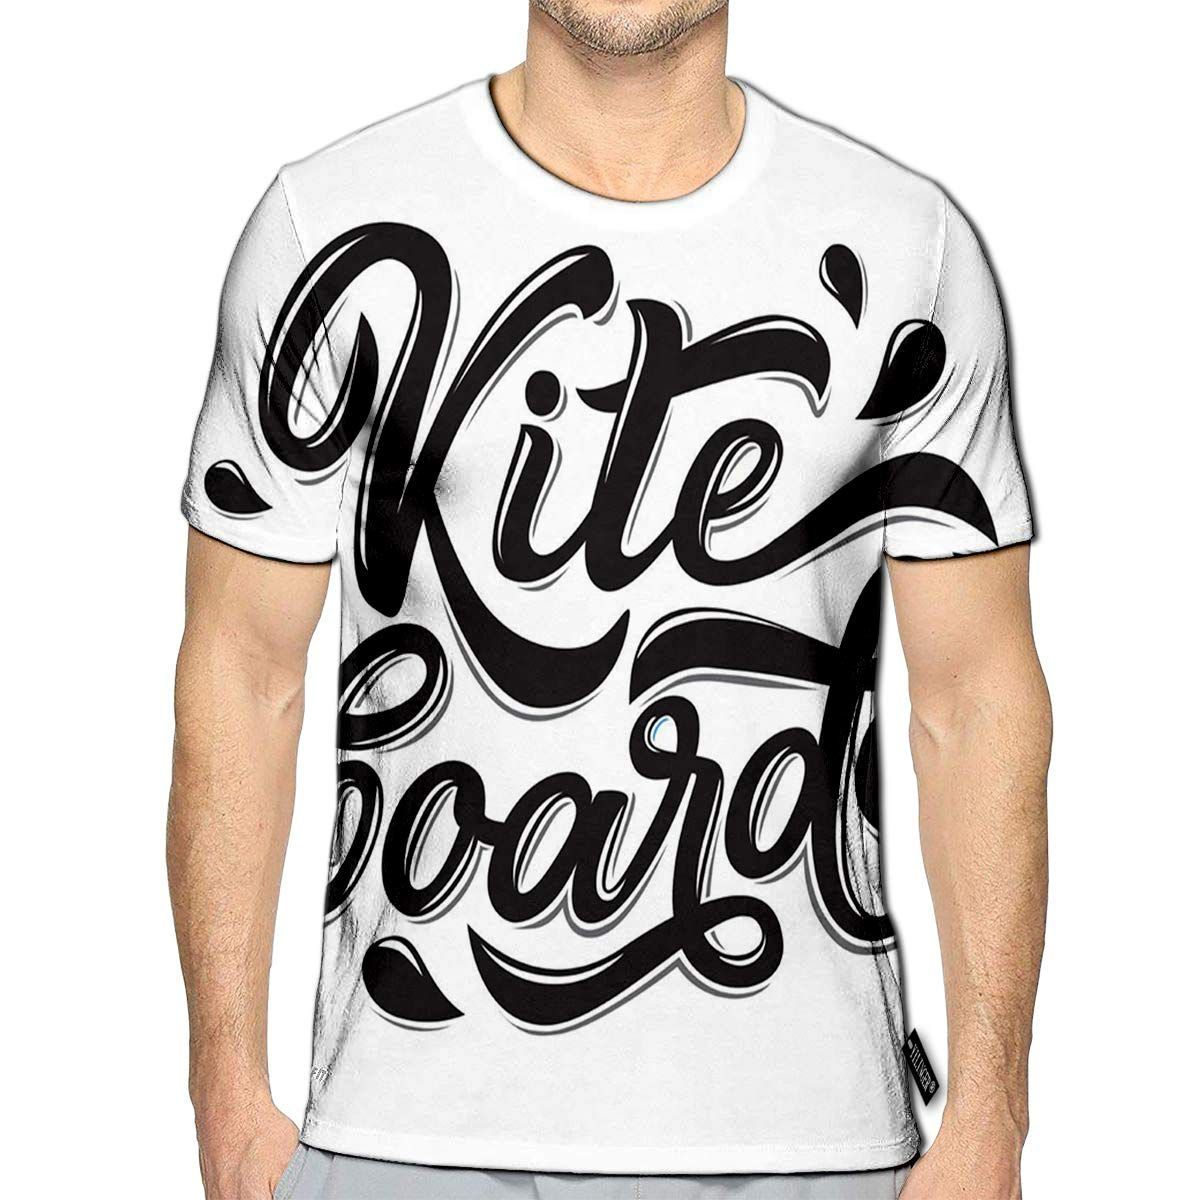 Negi Id Rather Be Squatchin Boy Short-Sleeve T-Shirts